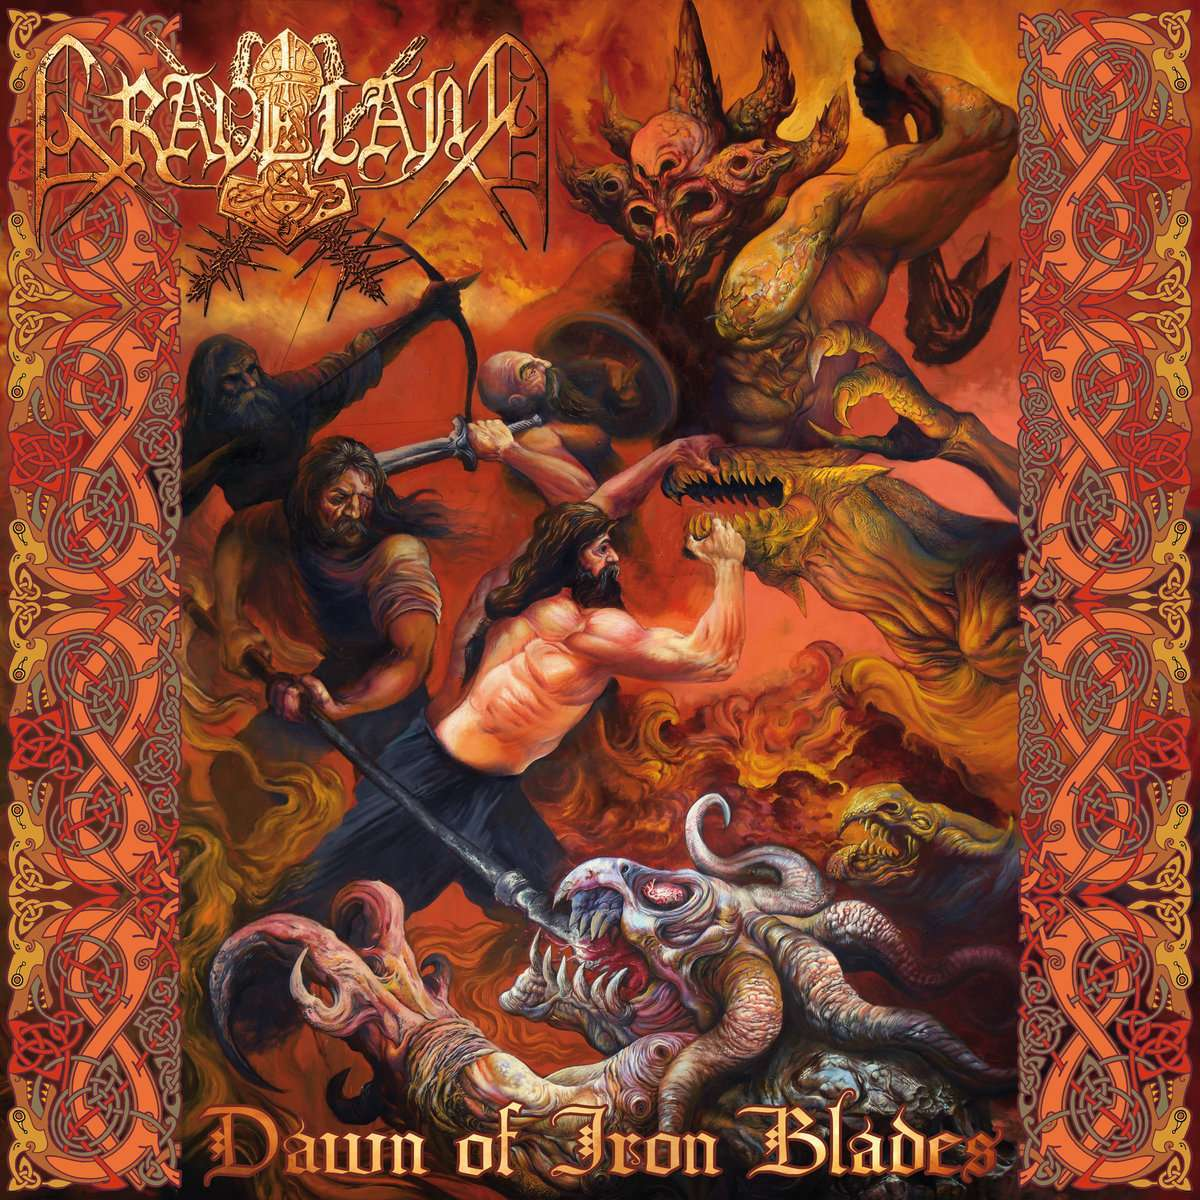 Graveland - Dawn of Iron Blades